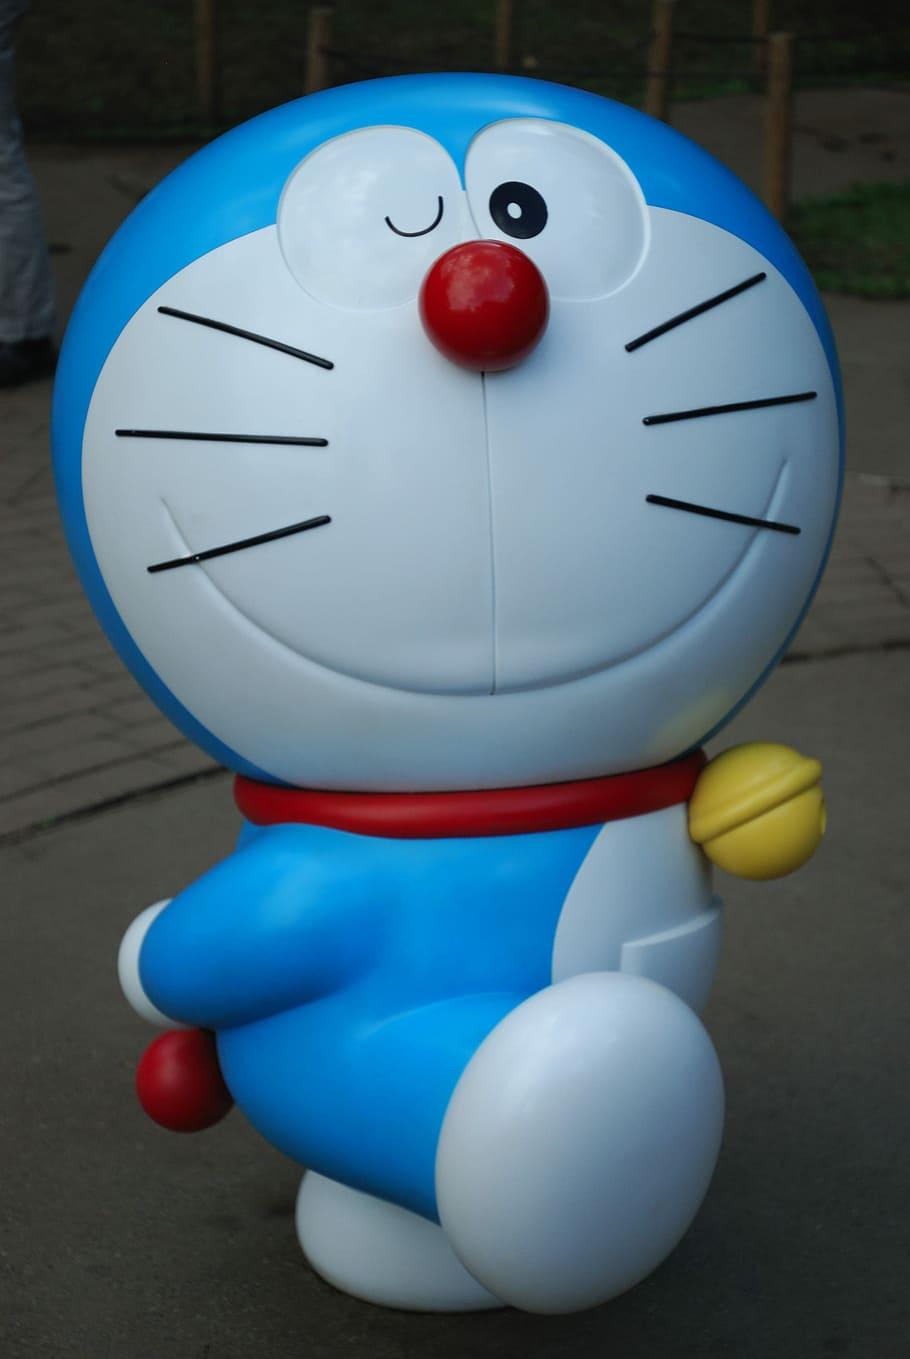 Doraemon Toy, Anime, Japan, Cat, Dorachan, Symbol, - Gambar Anime Doraemon - HD Wallpaper